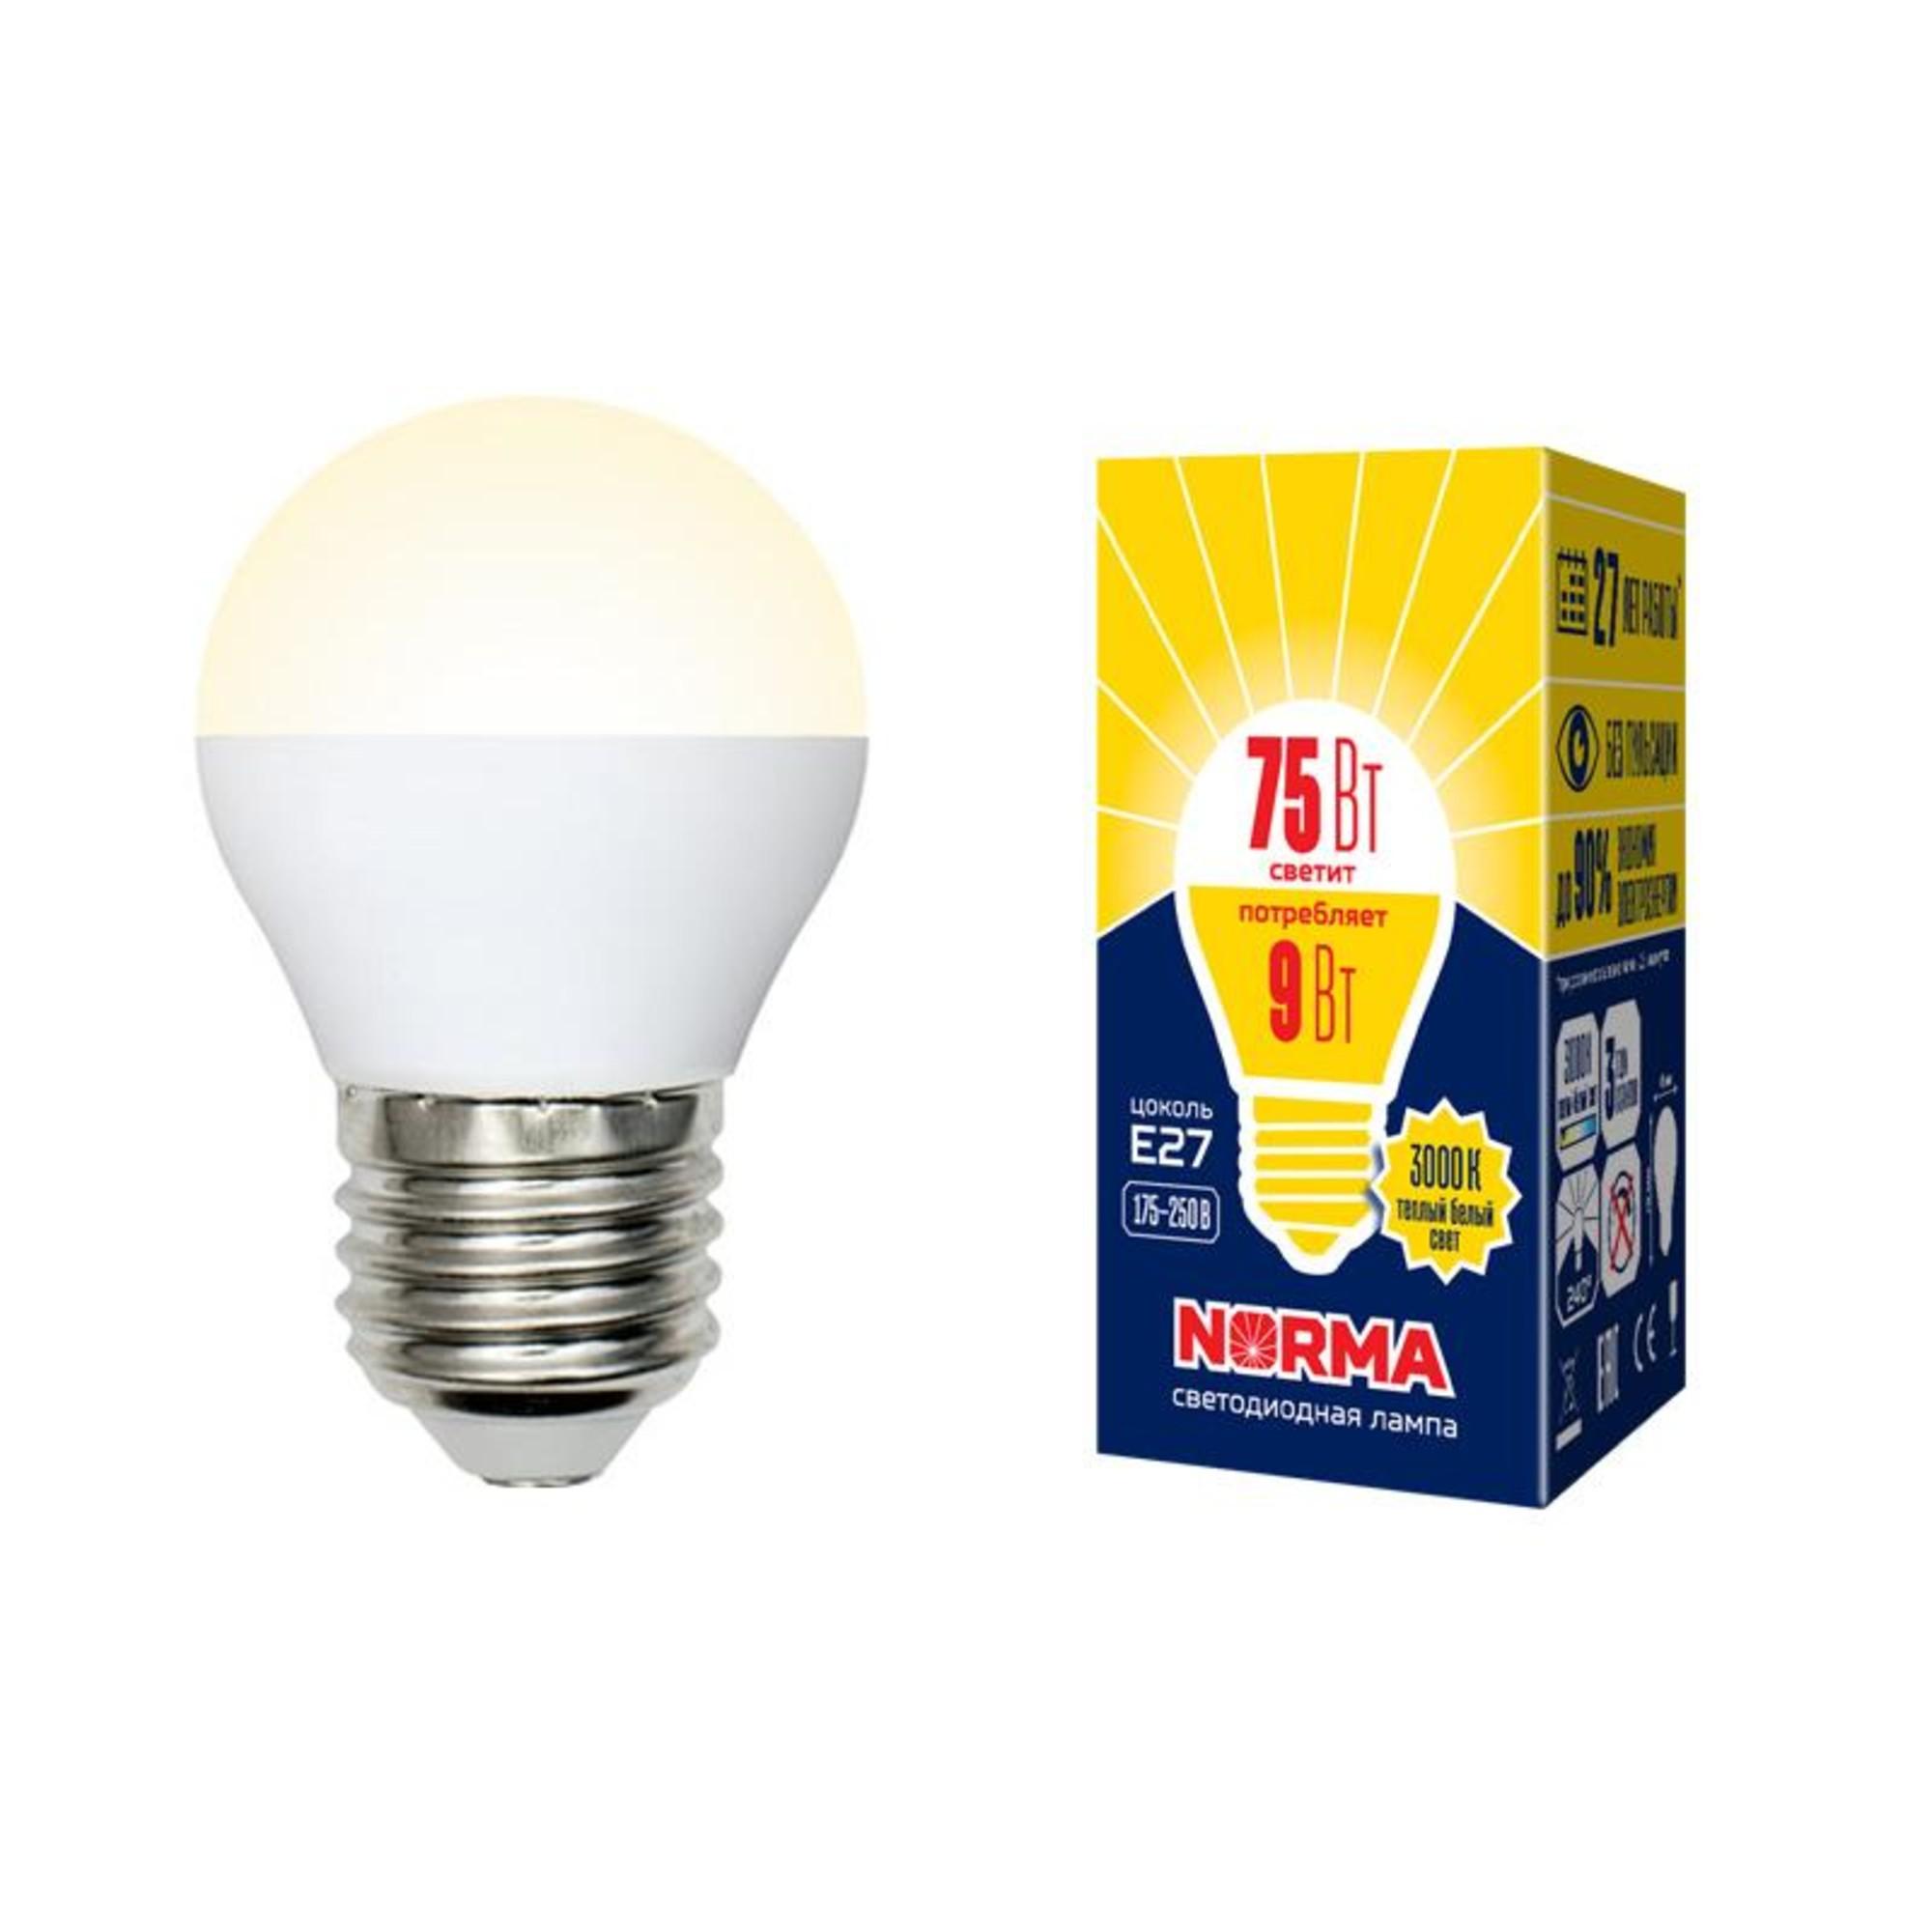 Лампа Volpe светодиодная E27 9 Вт теплый свет